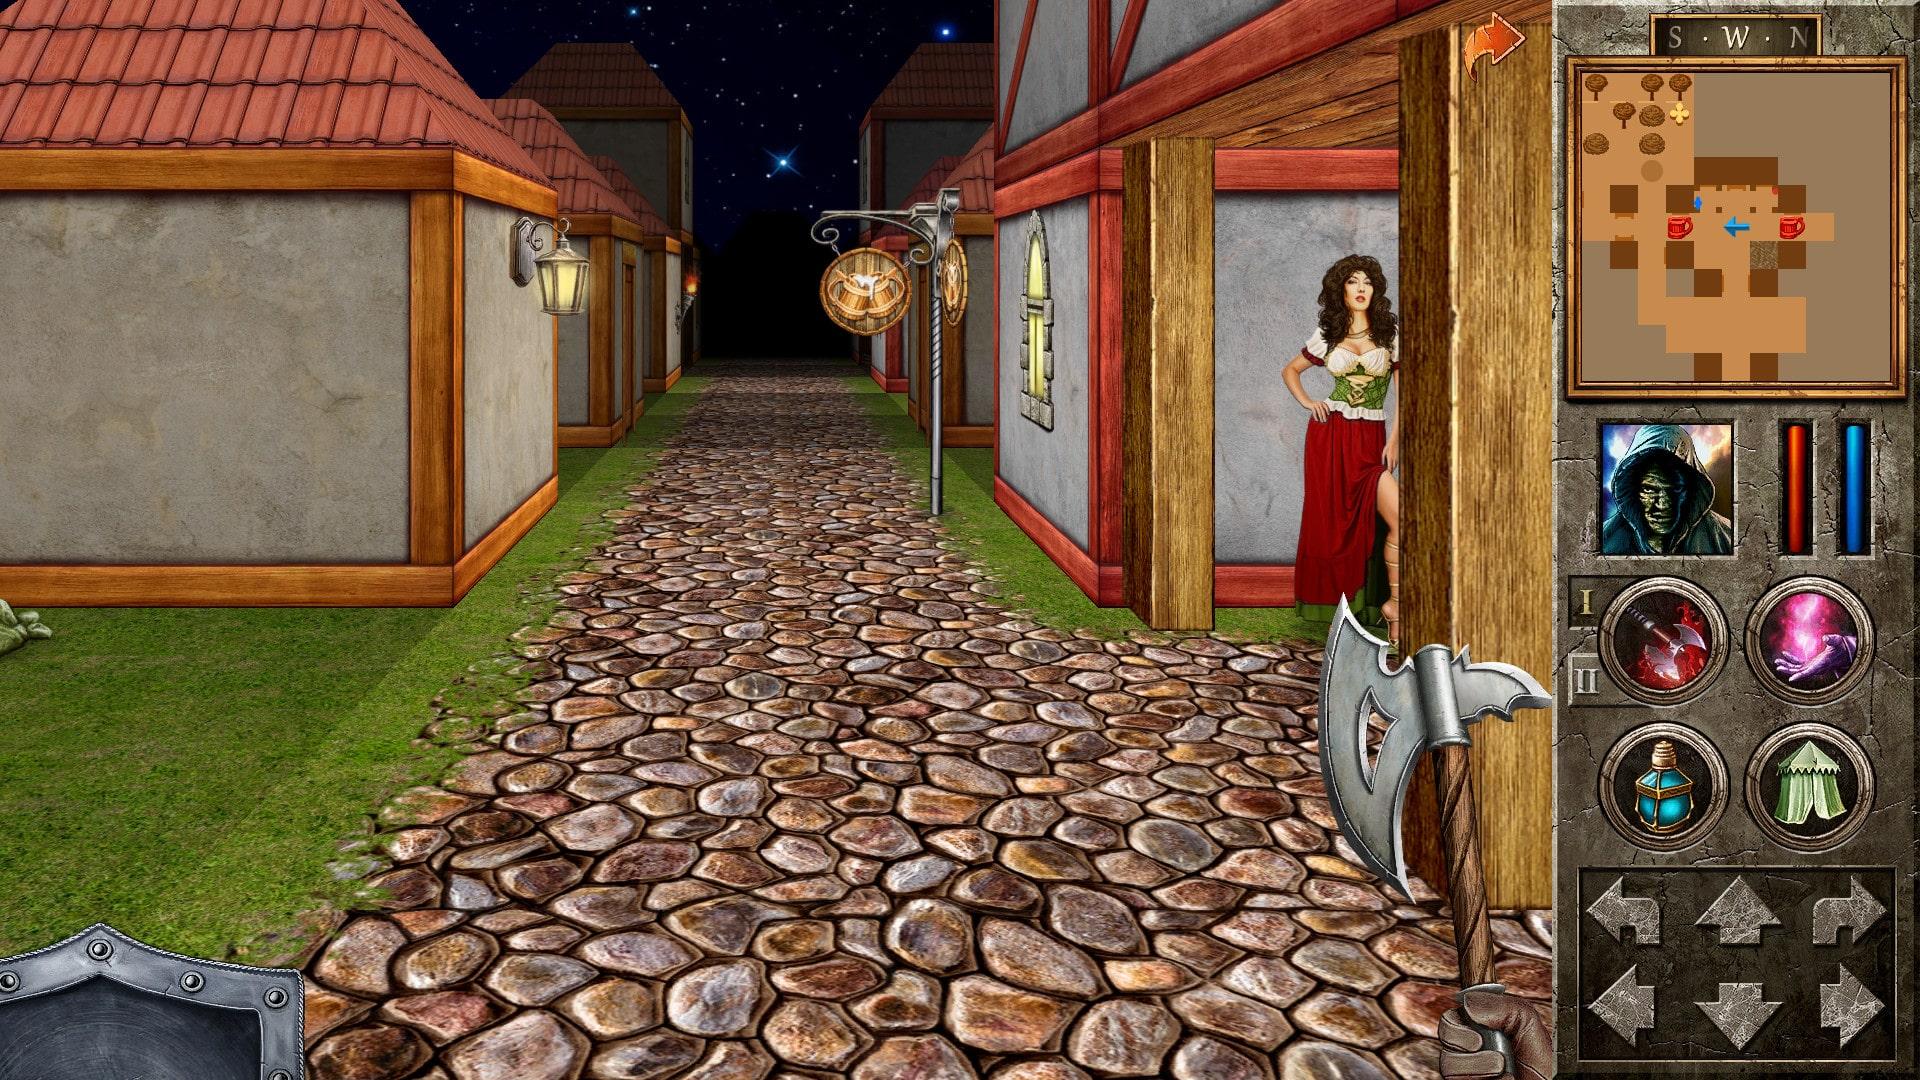 The Quest Screenshot 3